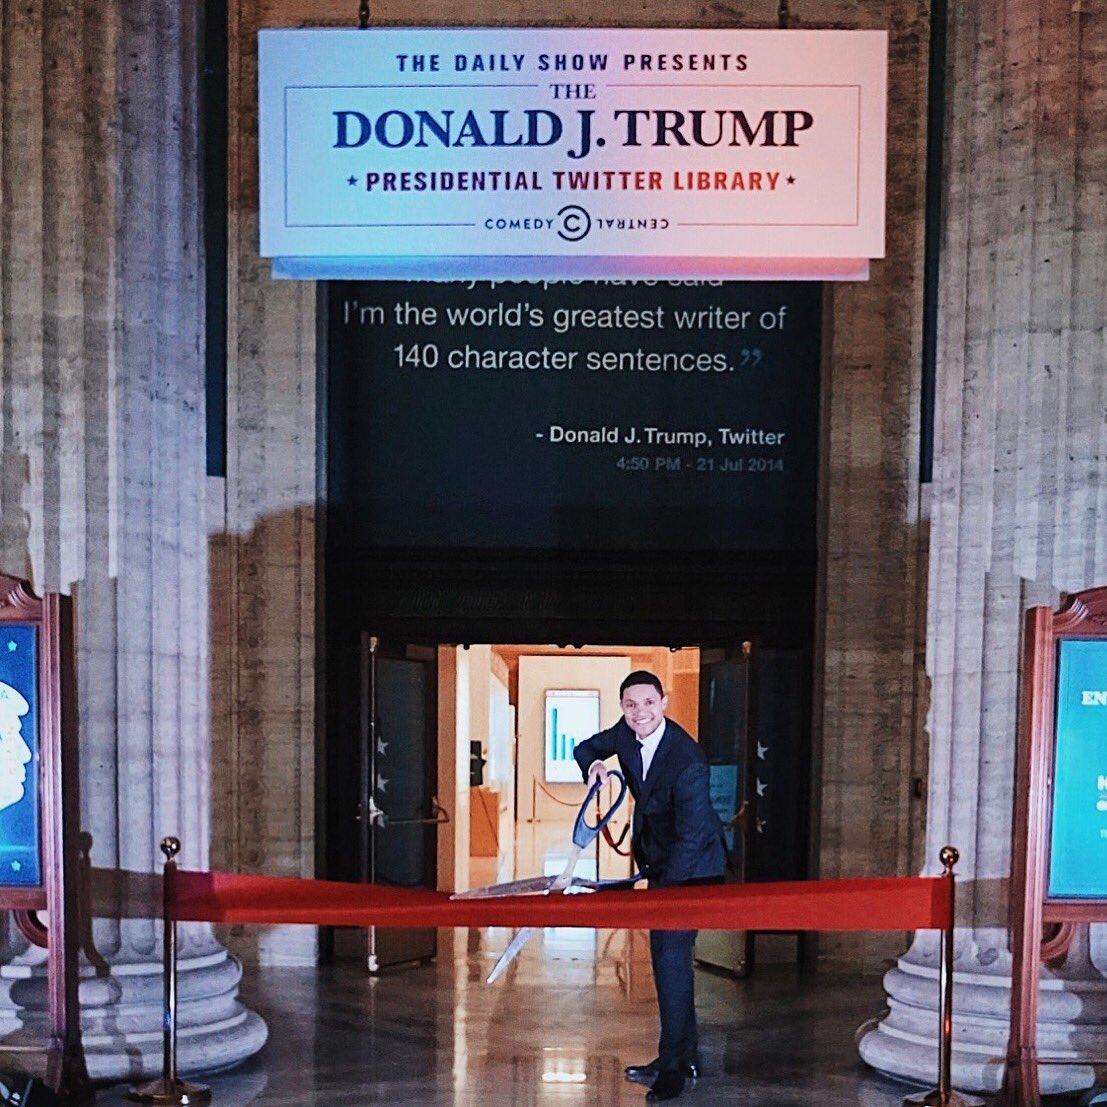 Chicago! The Donald J. Trump Presidentia...